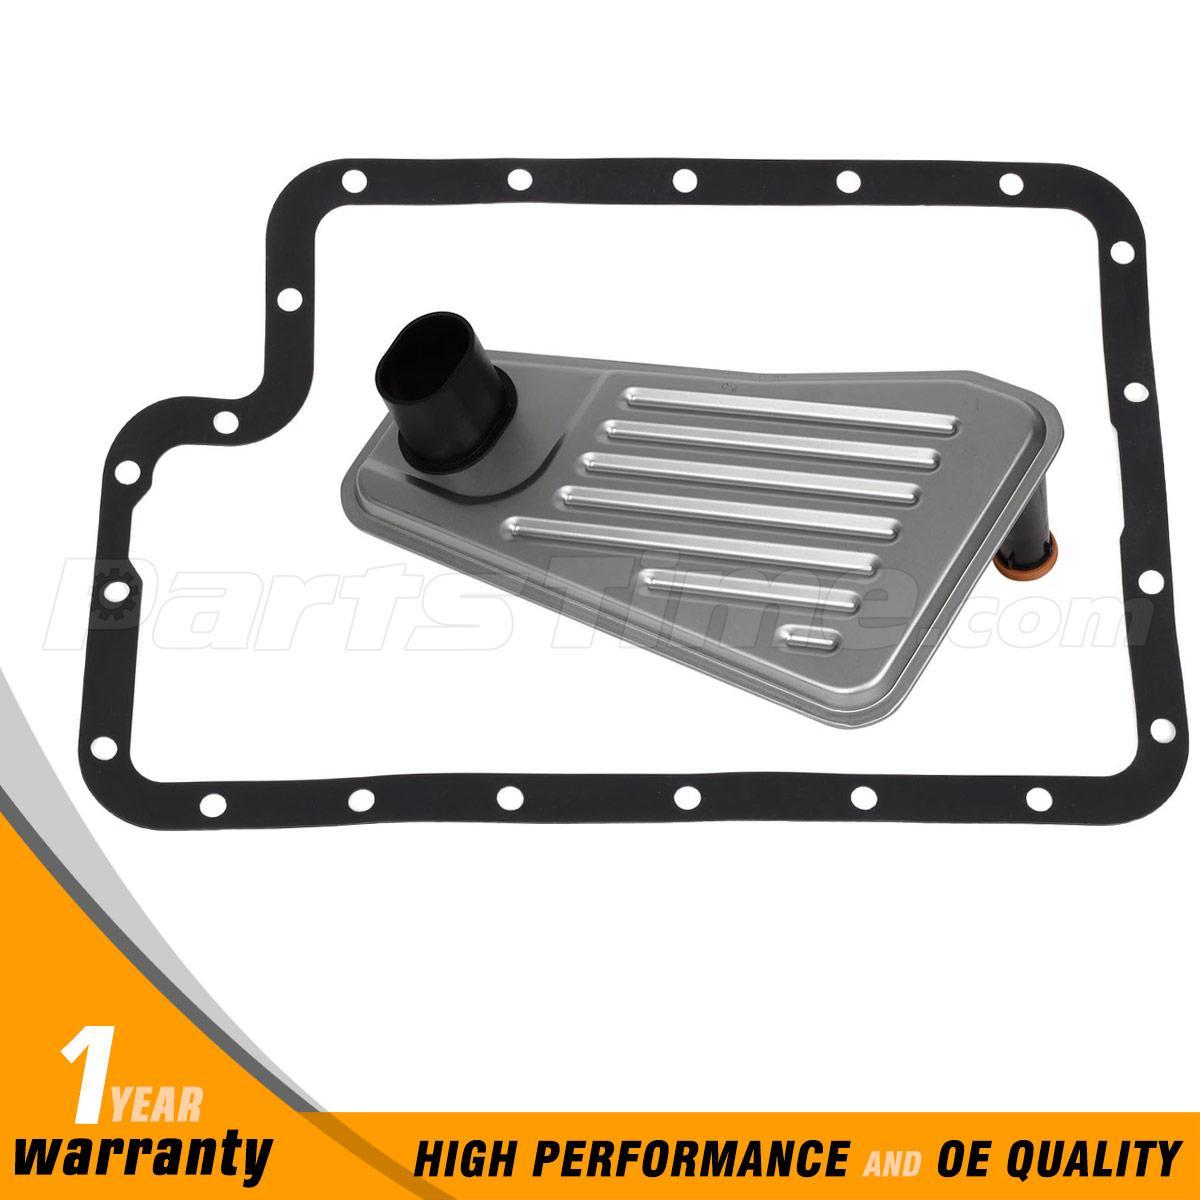 medium resolution of 5r110 wire harness manual guide wiring diagram u2022 rh lancairforum com 5r110 pan 5r110 pan